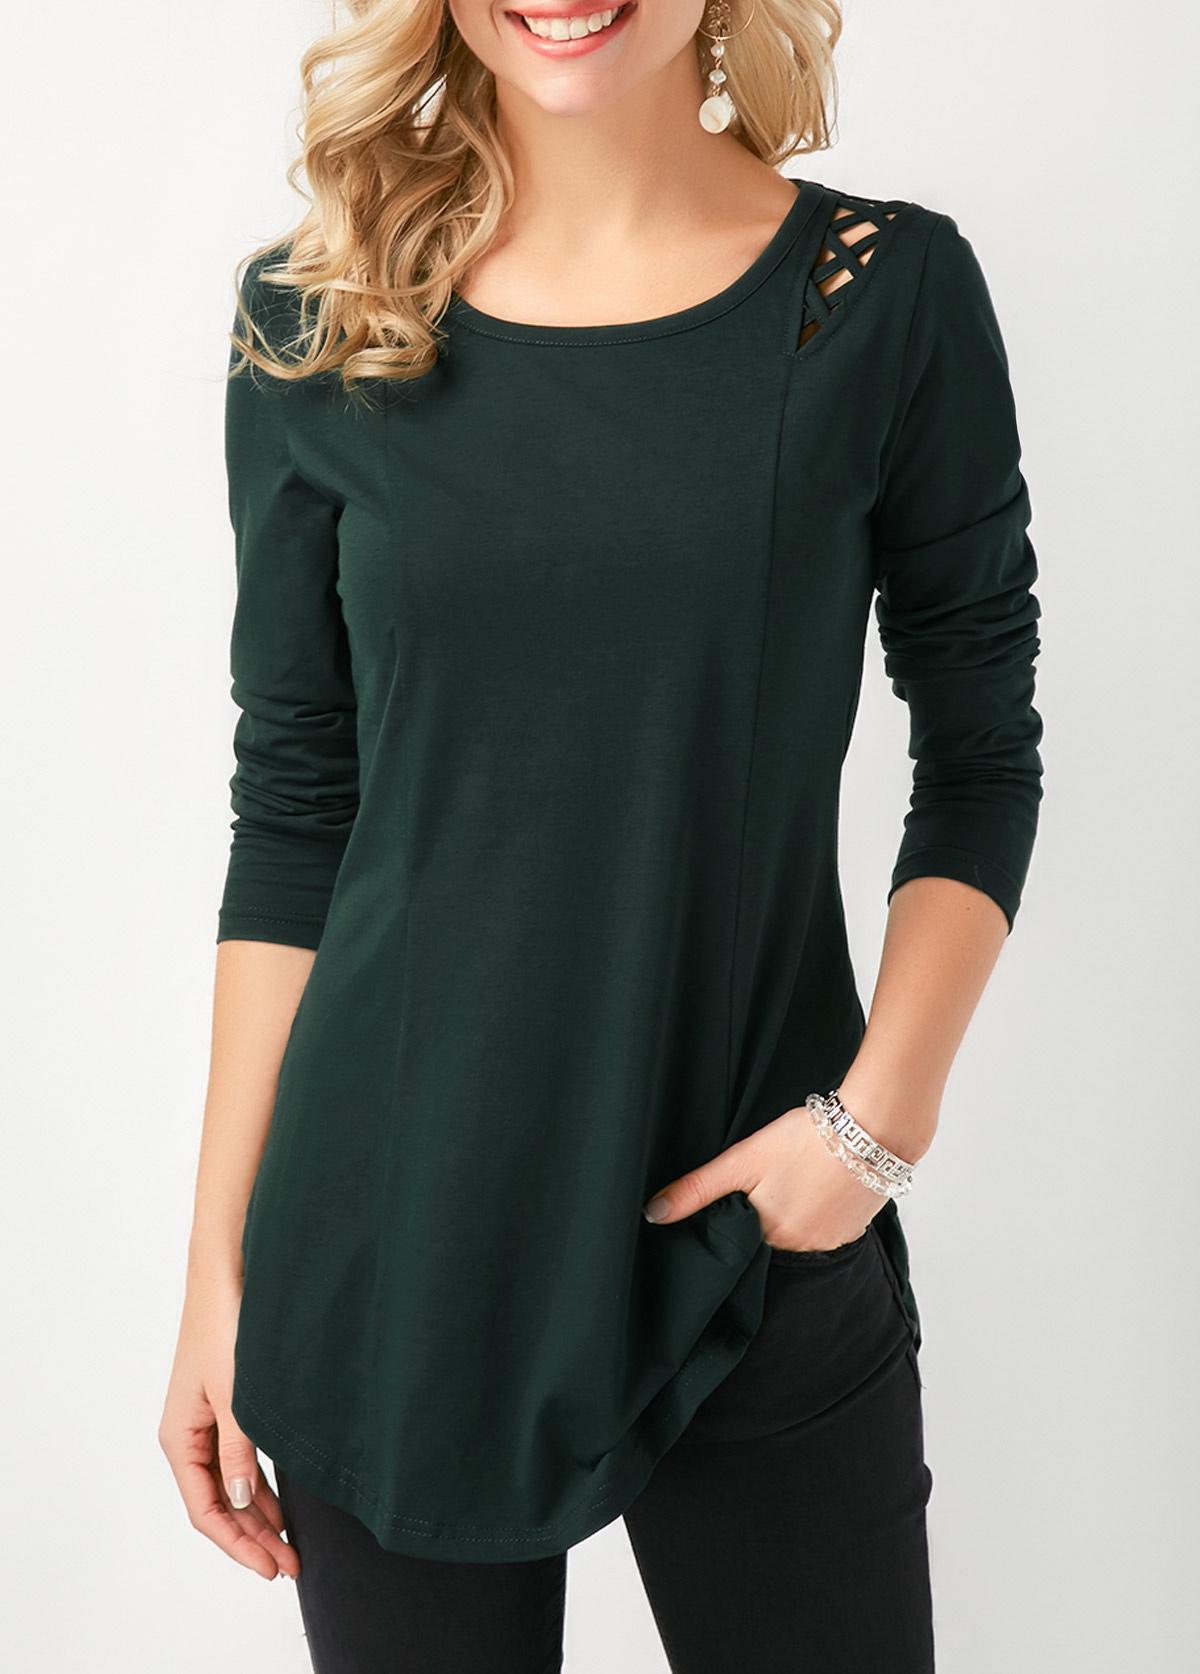 Lace Up Curved Hem Long Sleeve T Shirt